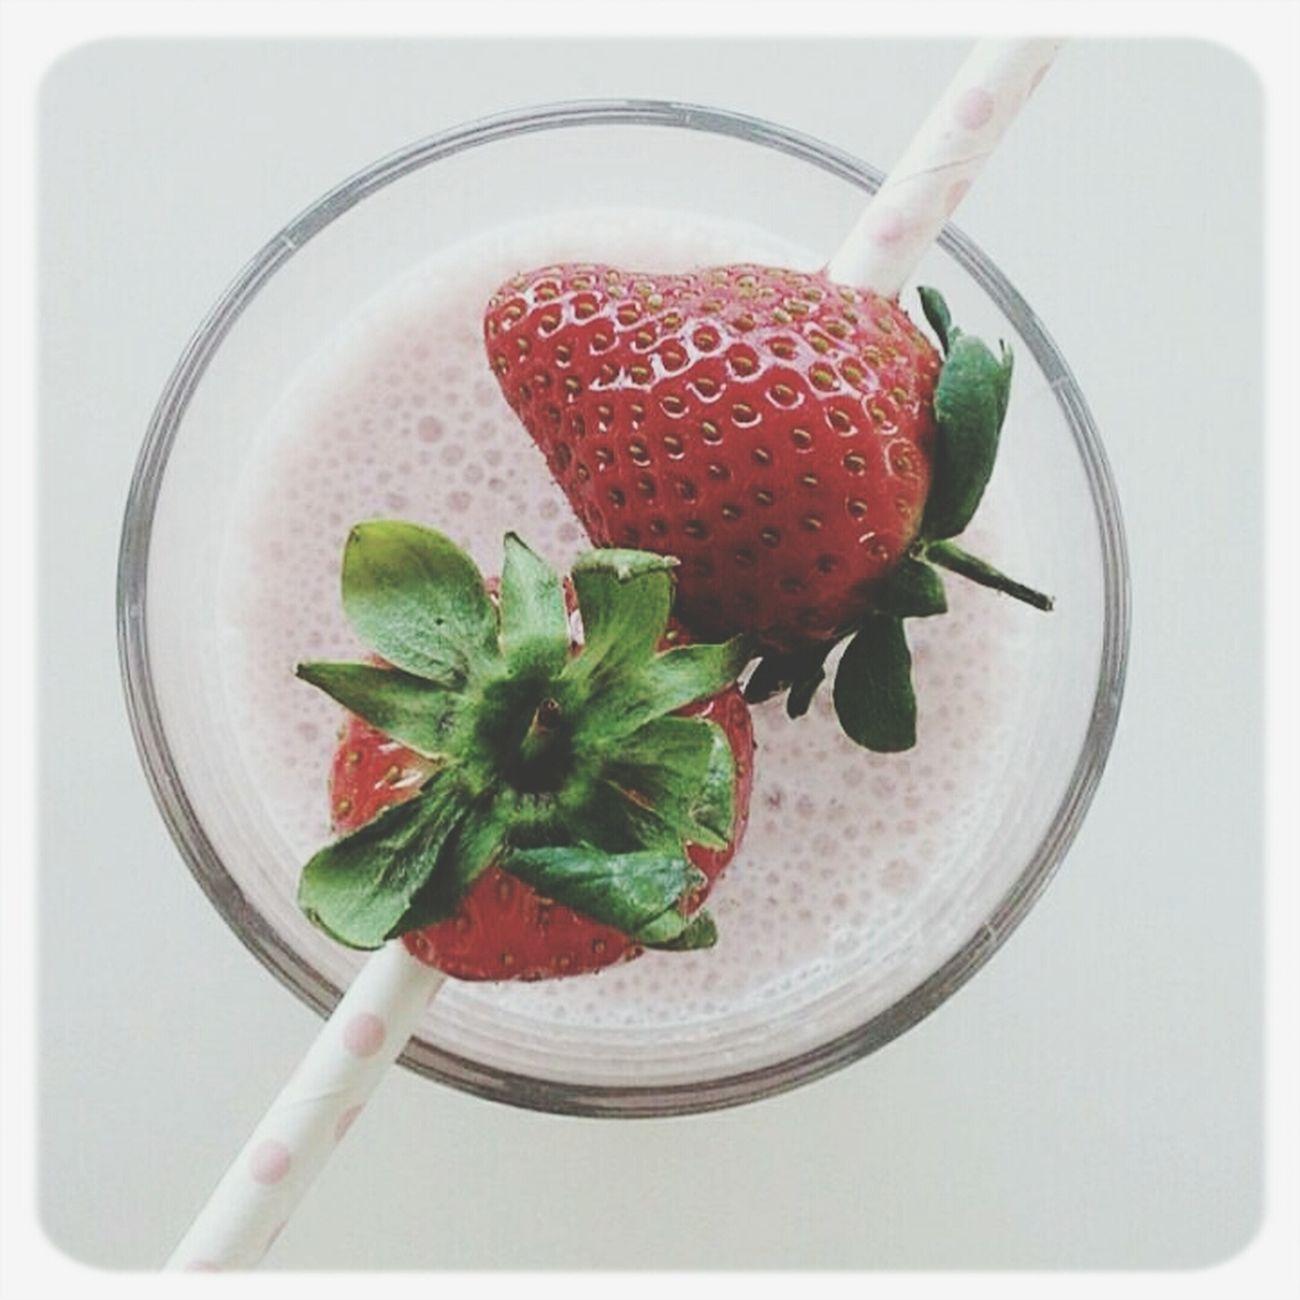 Smoothie Strawberry Smoothie Drinking A Smoothie Fruit Smoothie